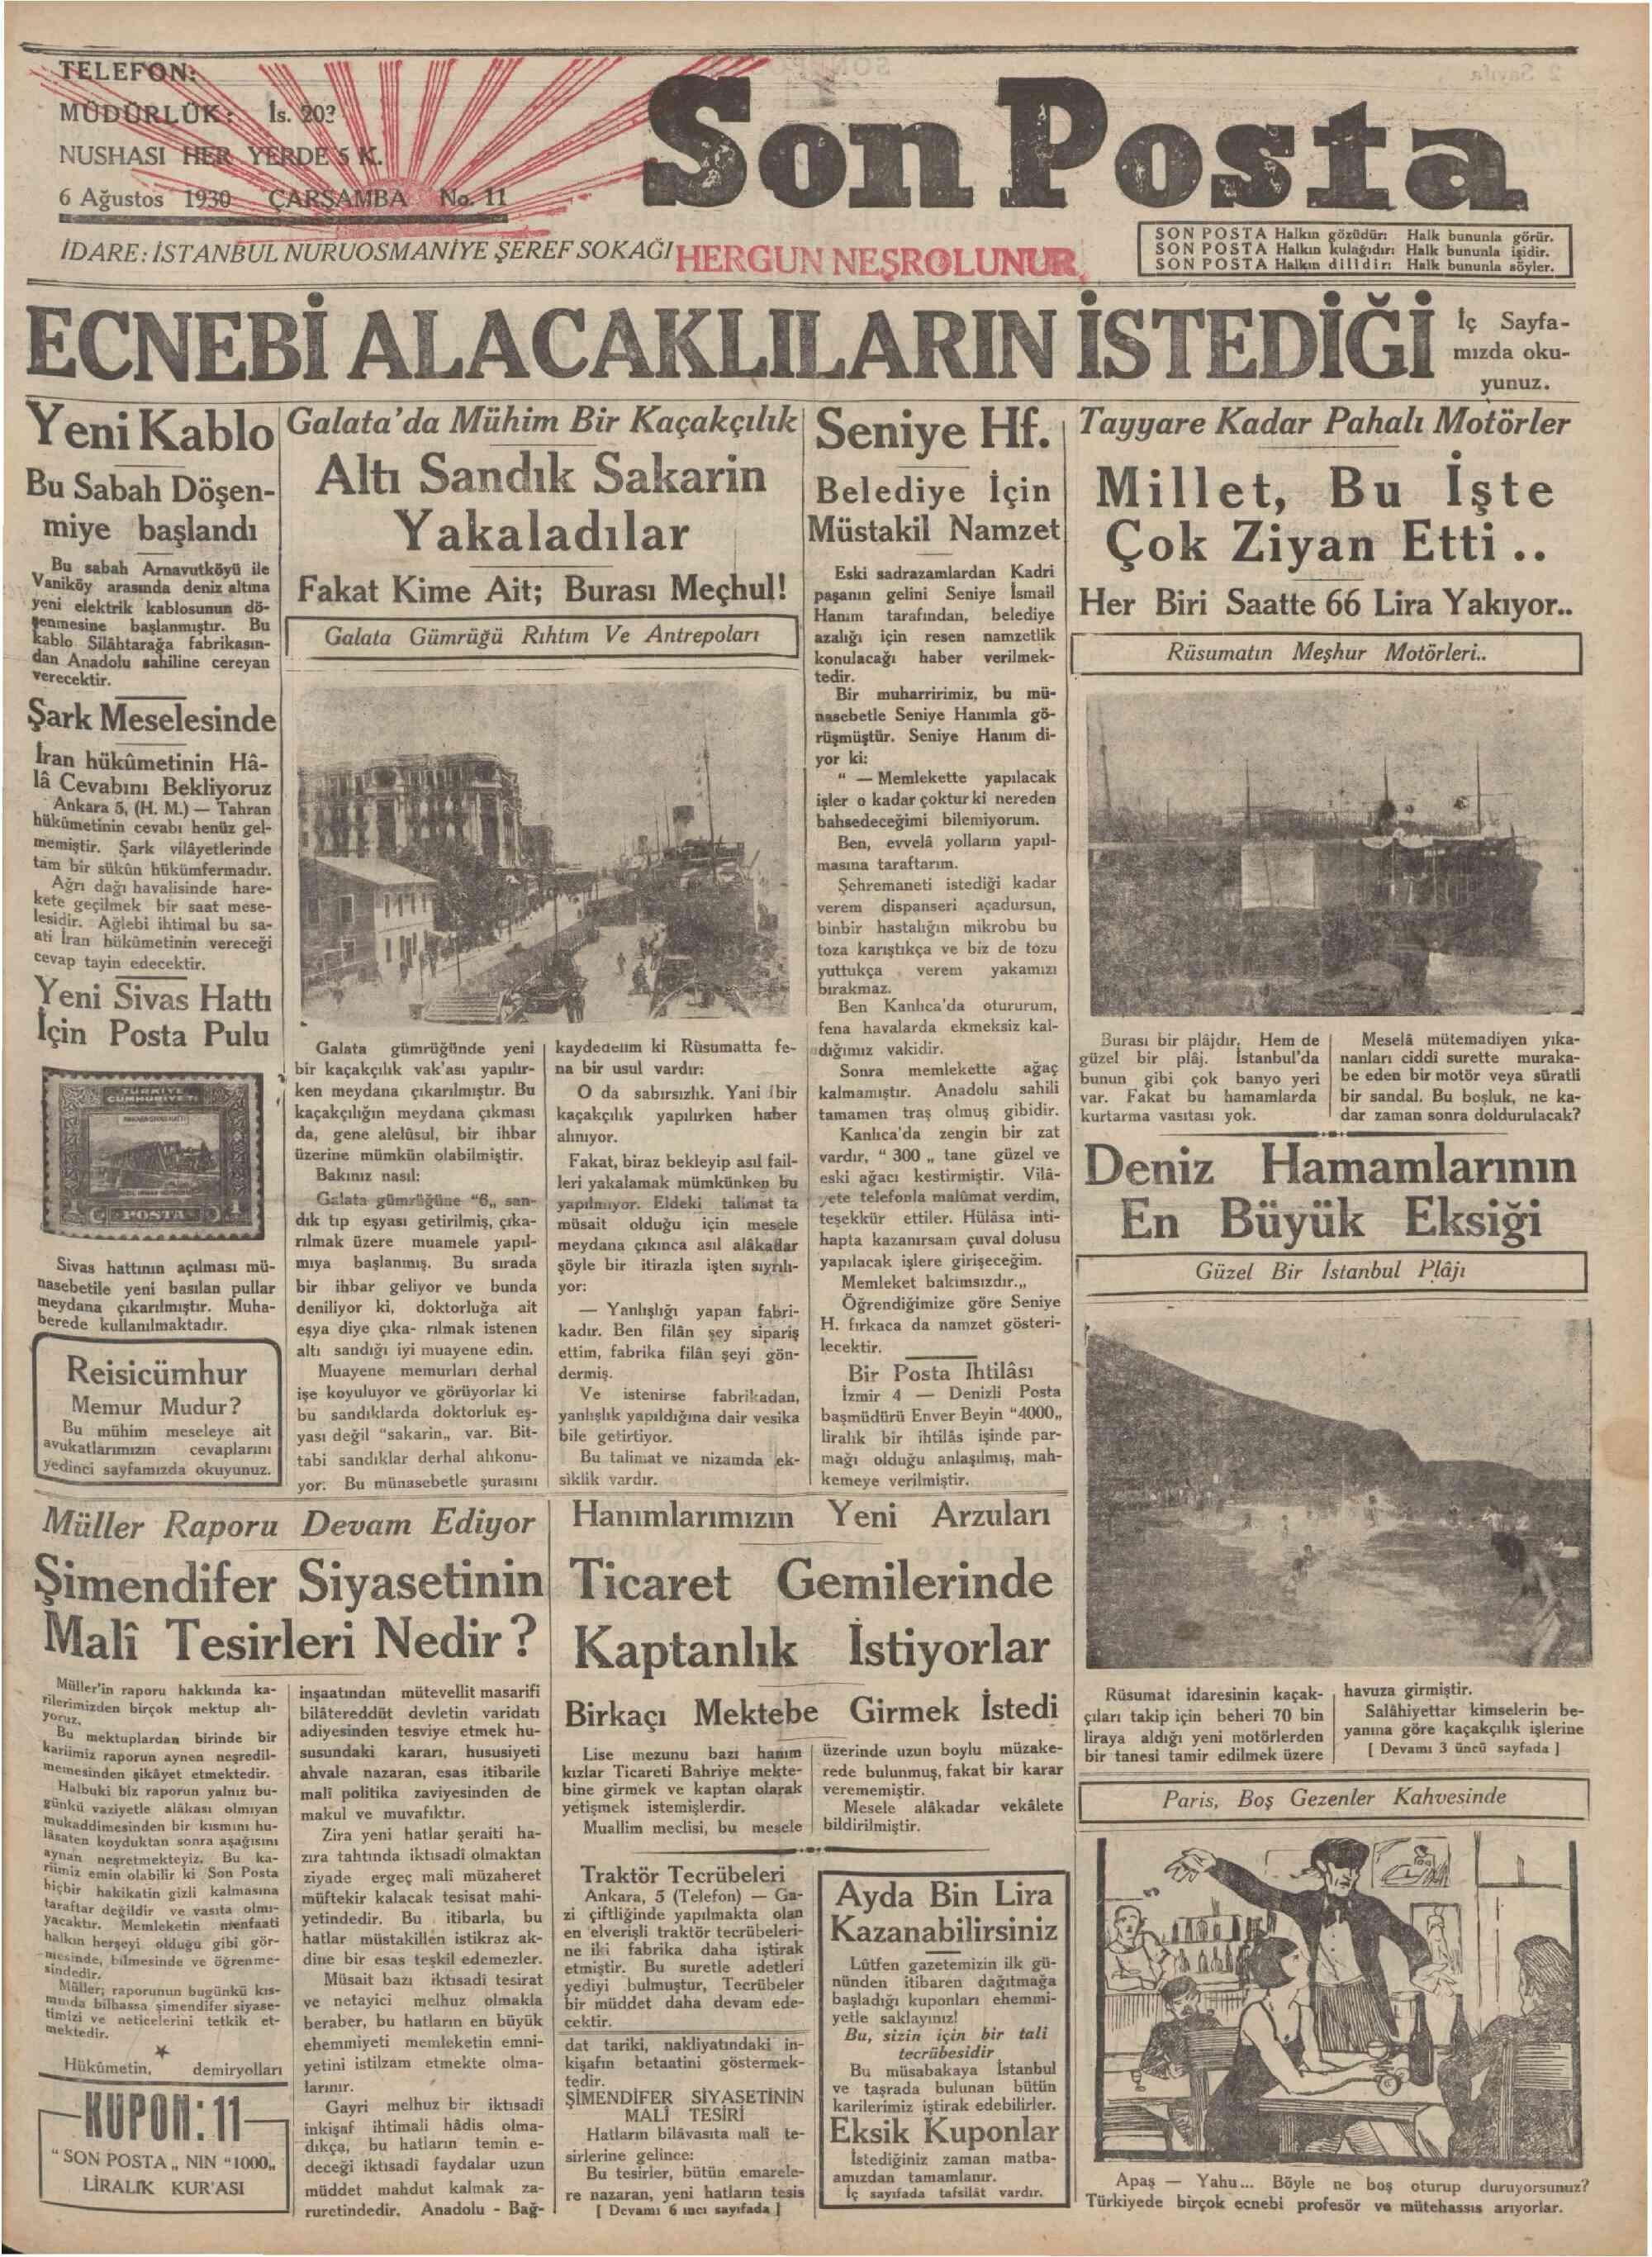 6 Ağustos 1930 Tarihli Son Posta Gazetesi Sayfa 1